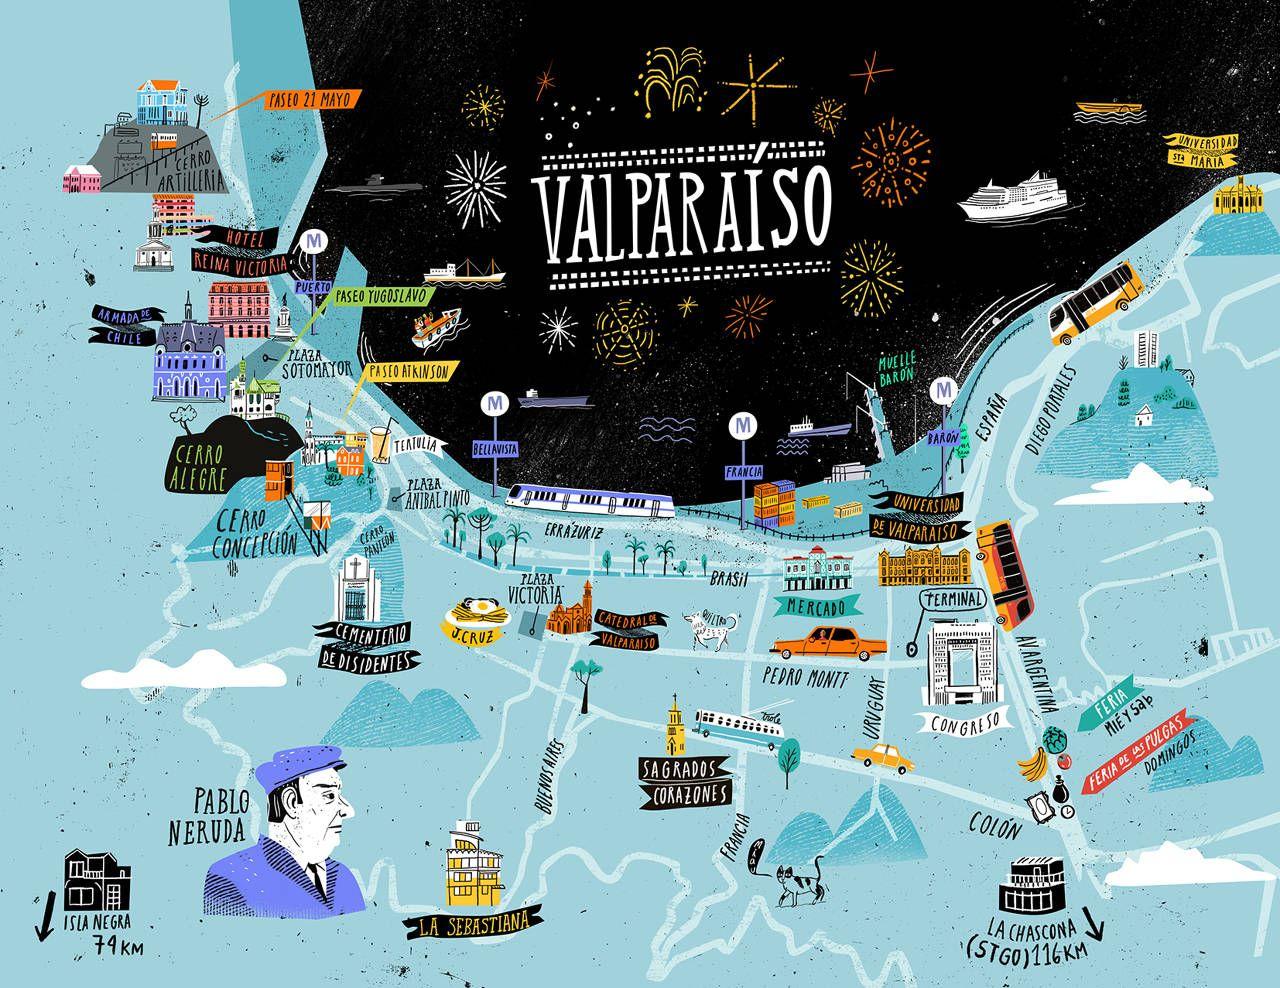 Valparaiso Map OYEMATHIAS Chile Pinterest Valparaiso